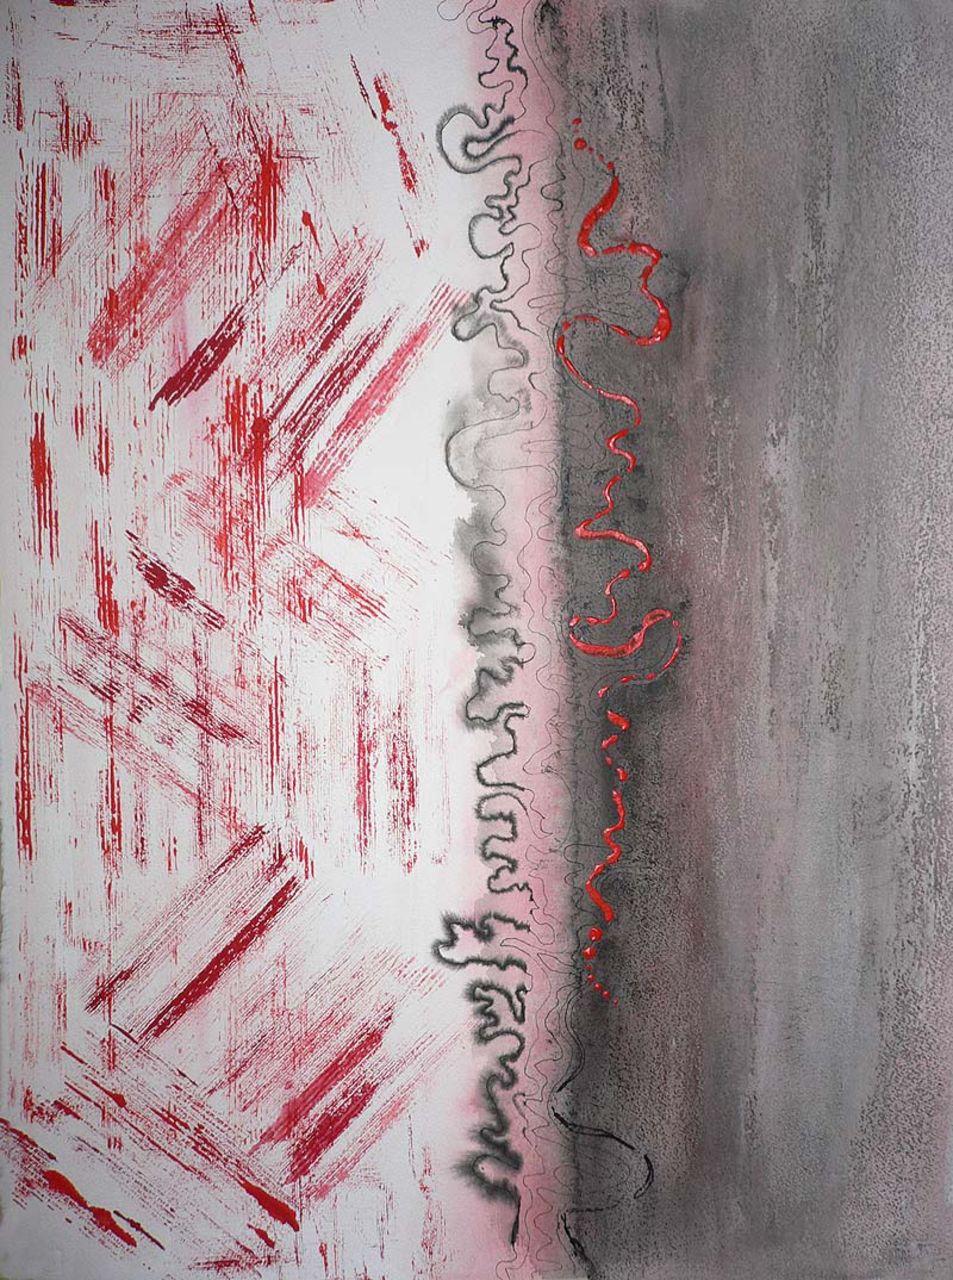 Valérie Bornet De sang et de feu